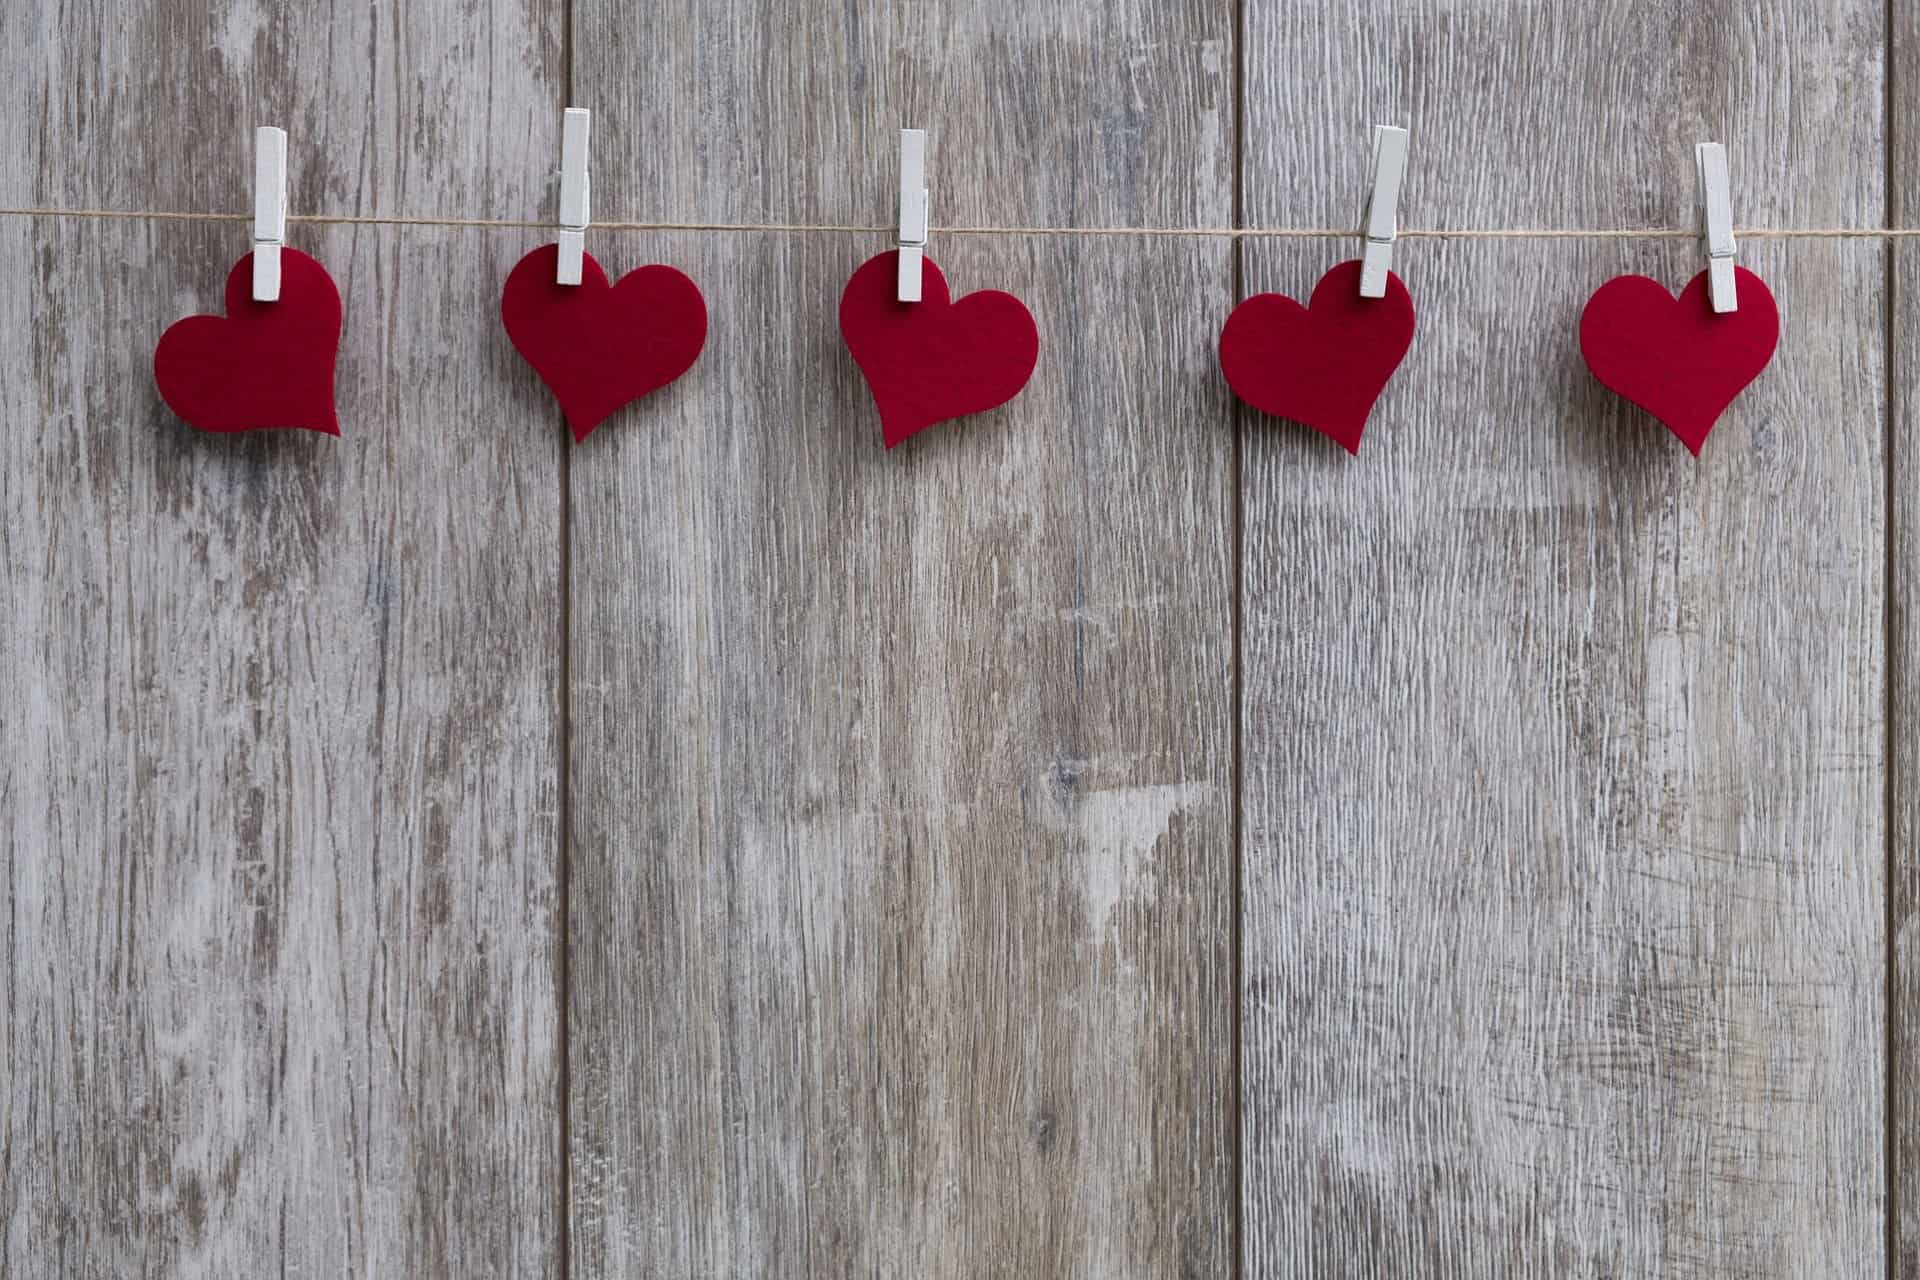 Image de saint valentin Pixabay par Bruno.Germany